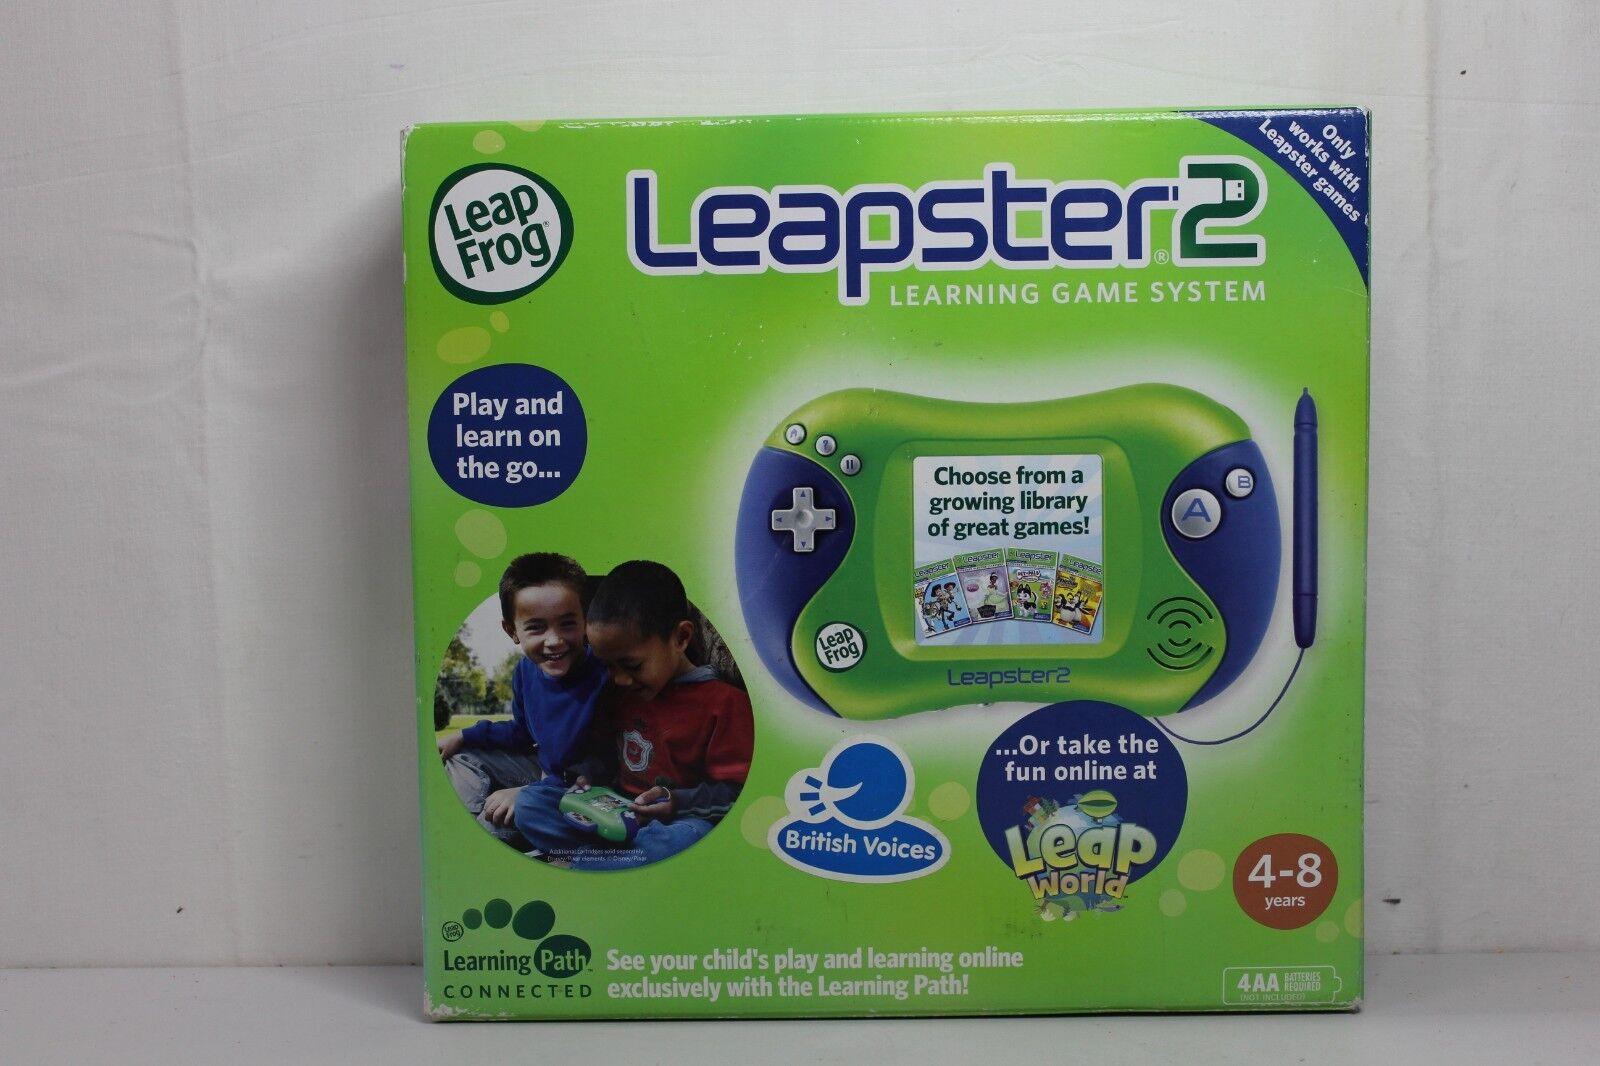 LeapFrog Leapster2 Gaming System (Green)